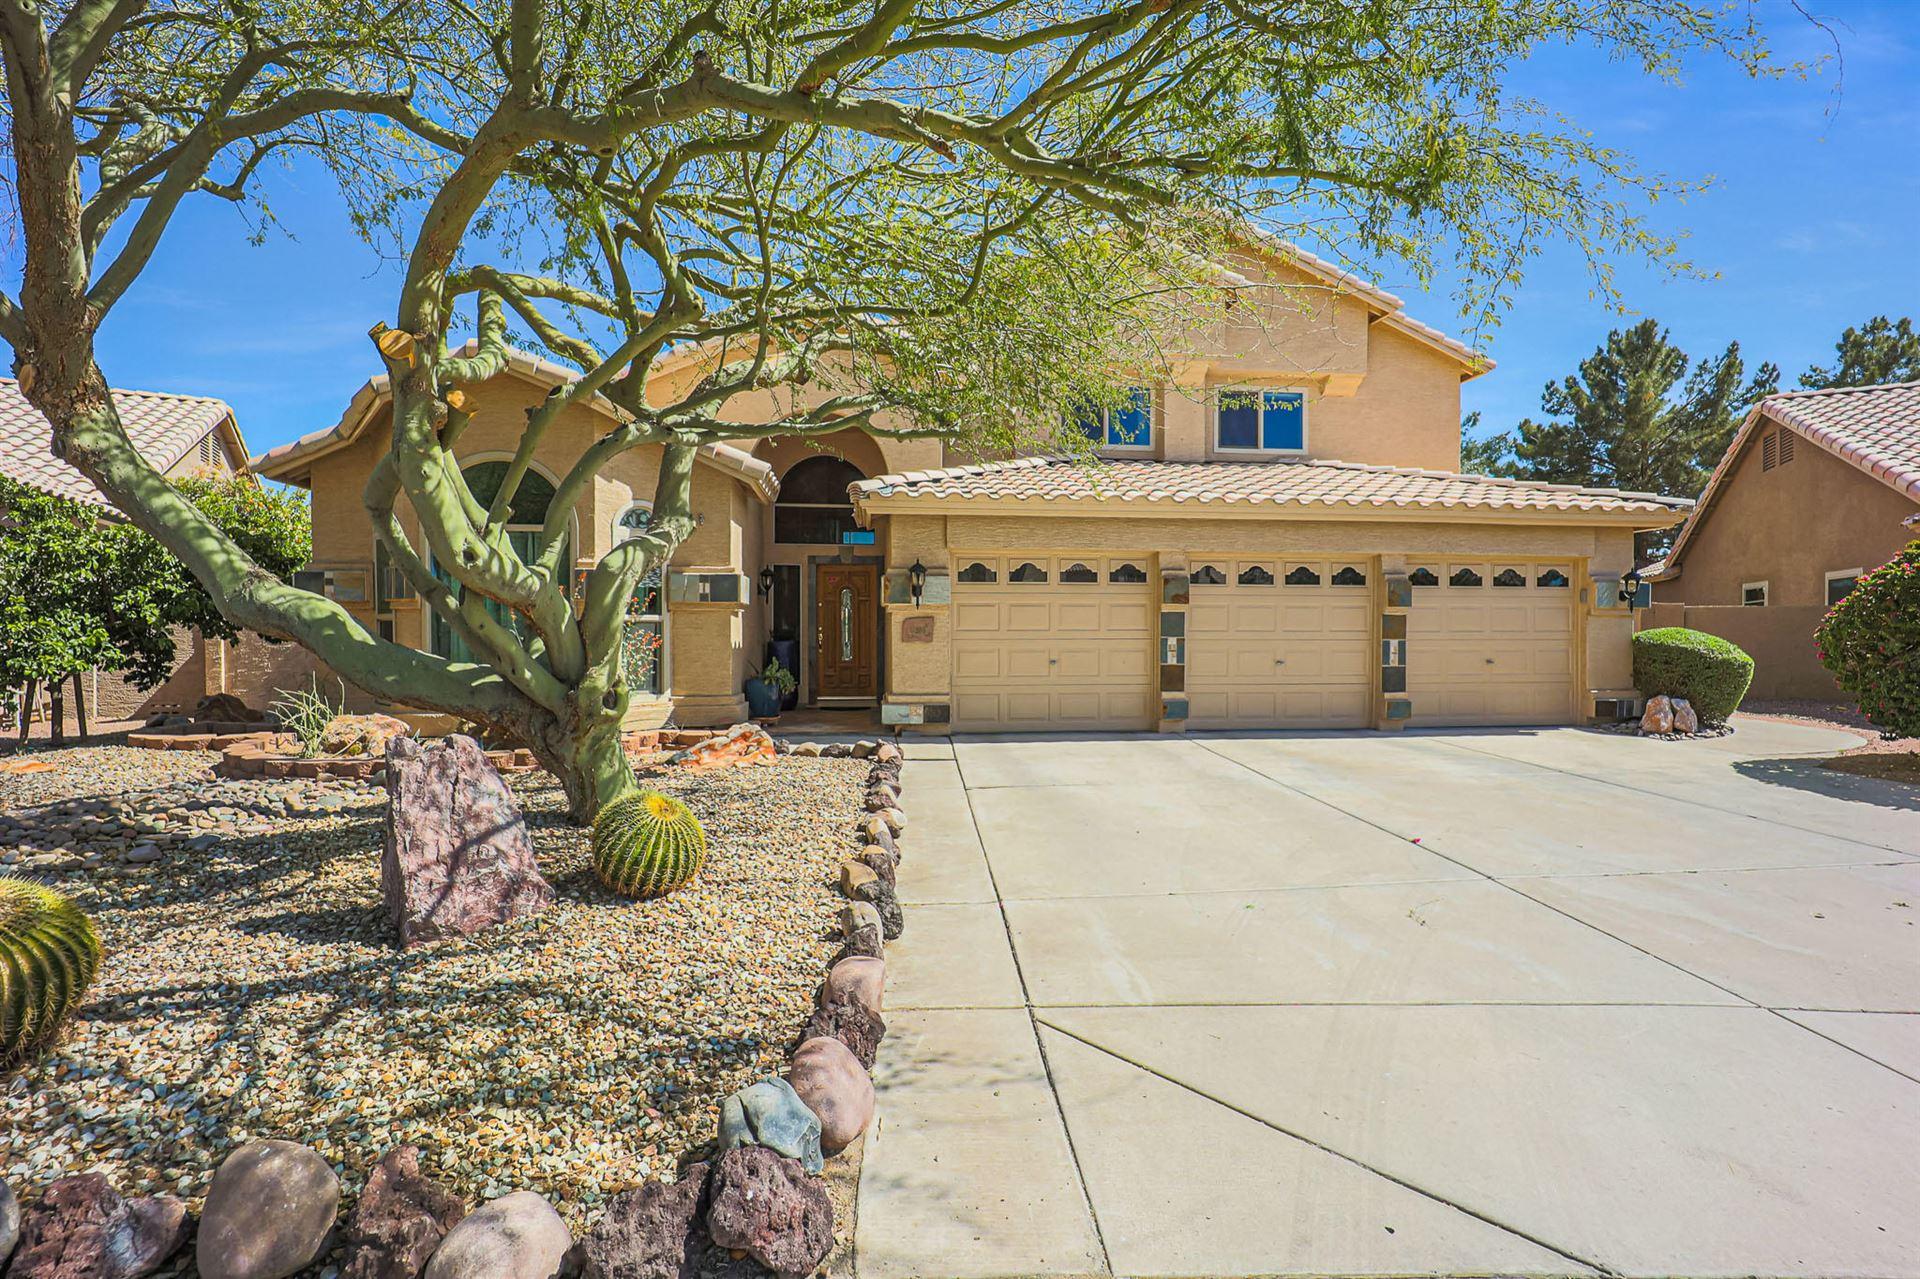 395 W Sagebrush Street, Gilbert, AZ 85233 - MLS#: 6233471